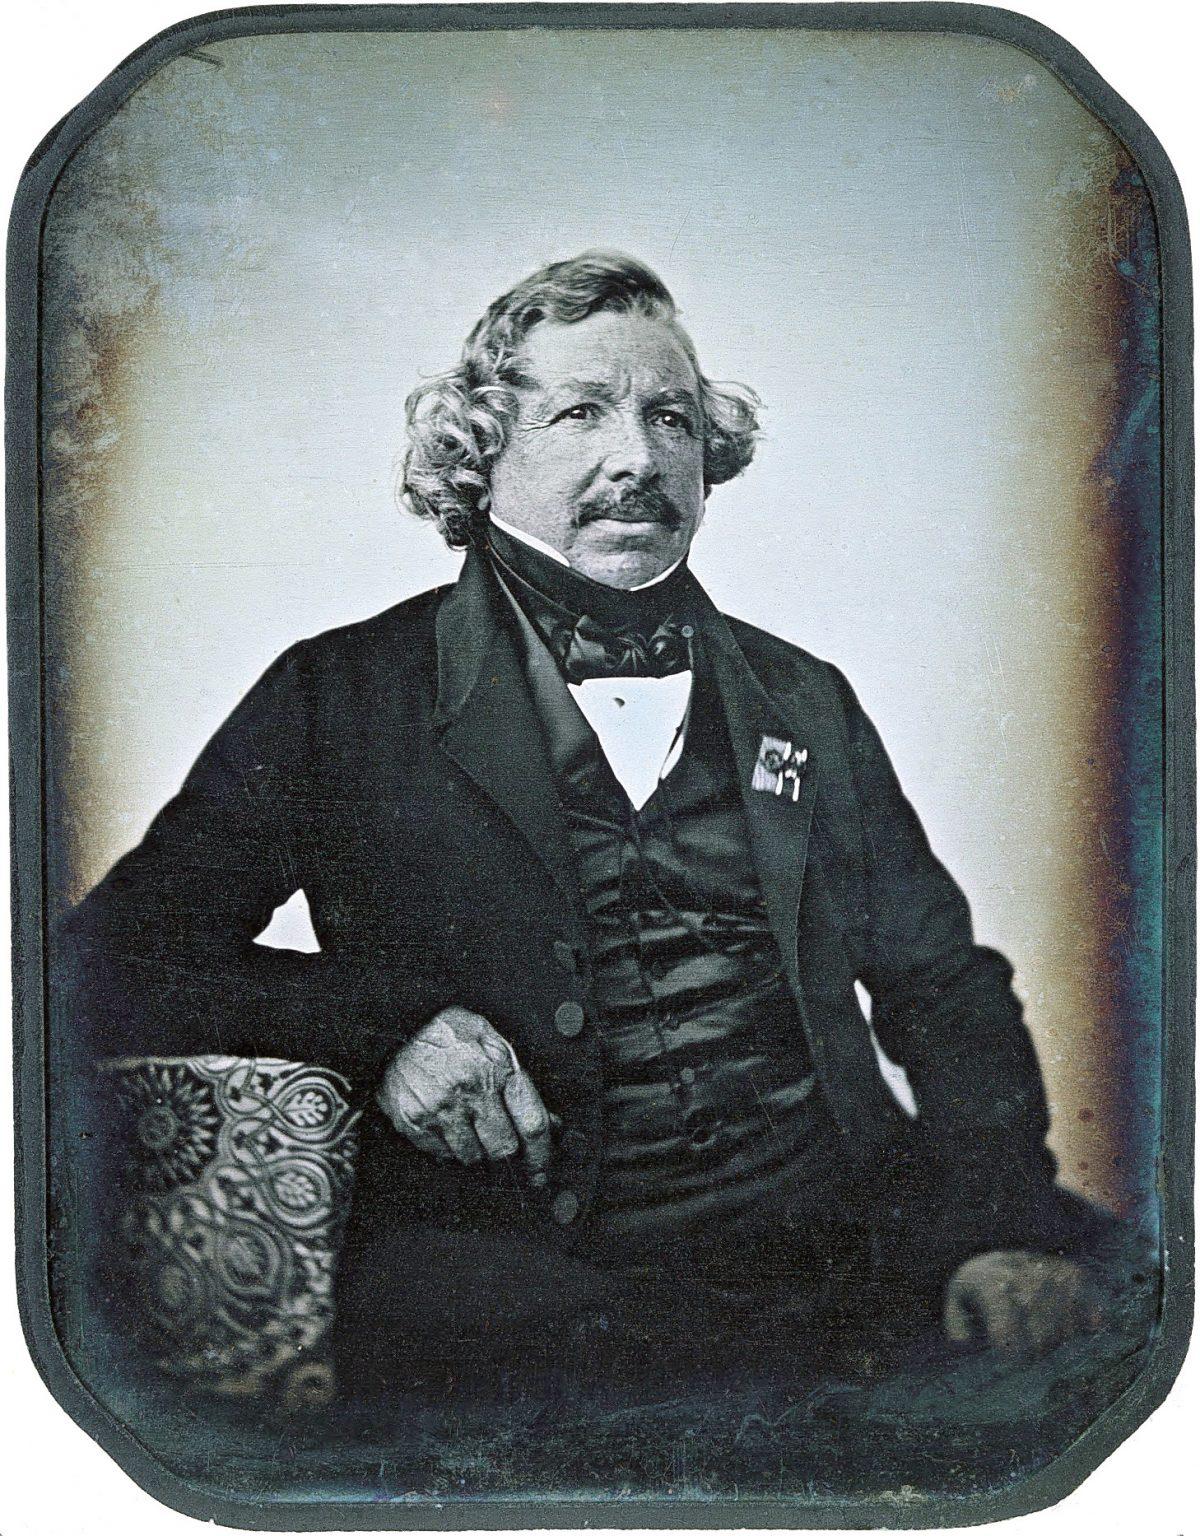 Daguerreotype portrait of Louis Daguerre, inventor of the process, photographed in 1844 by Jean-Baptiste Sabatier-Blot. Image in the public domain.